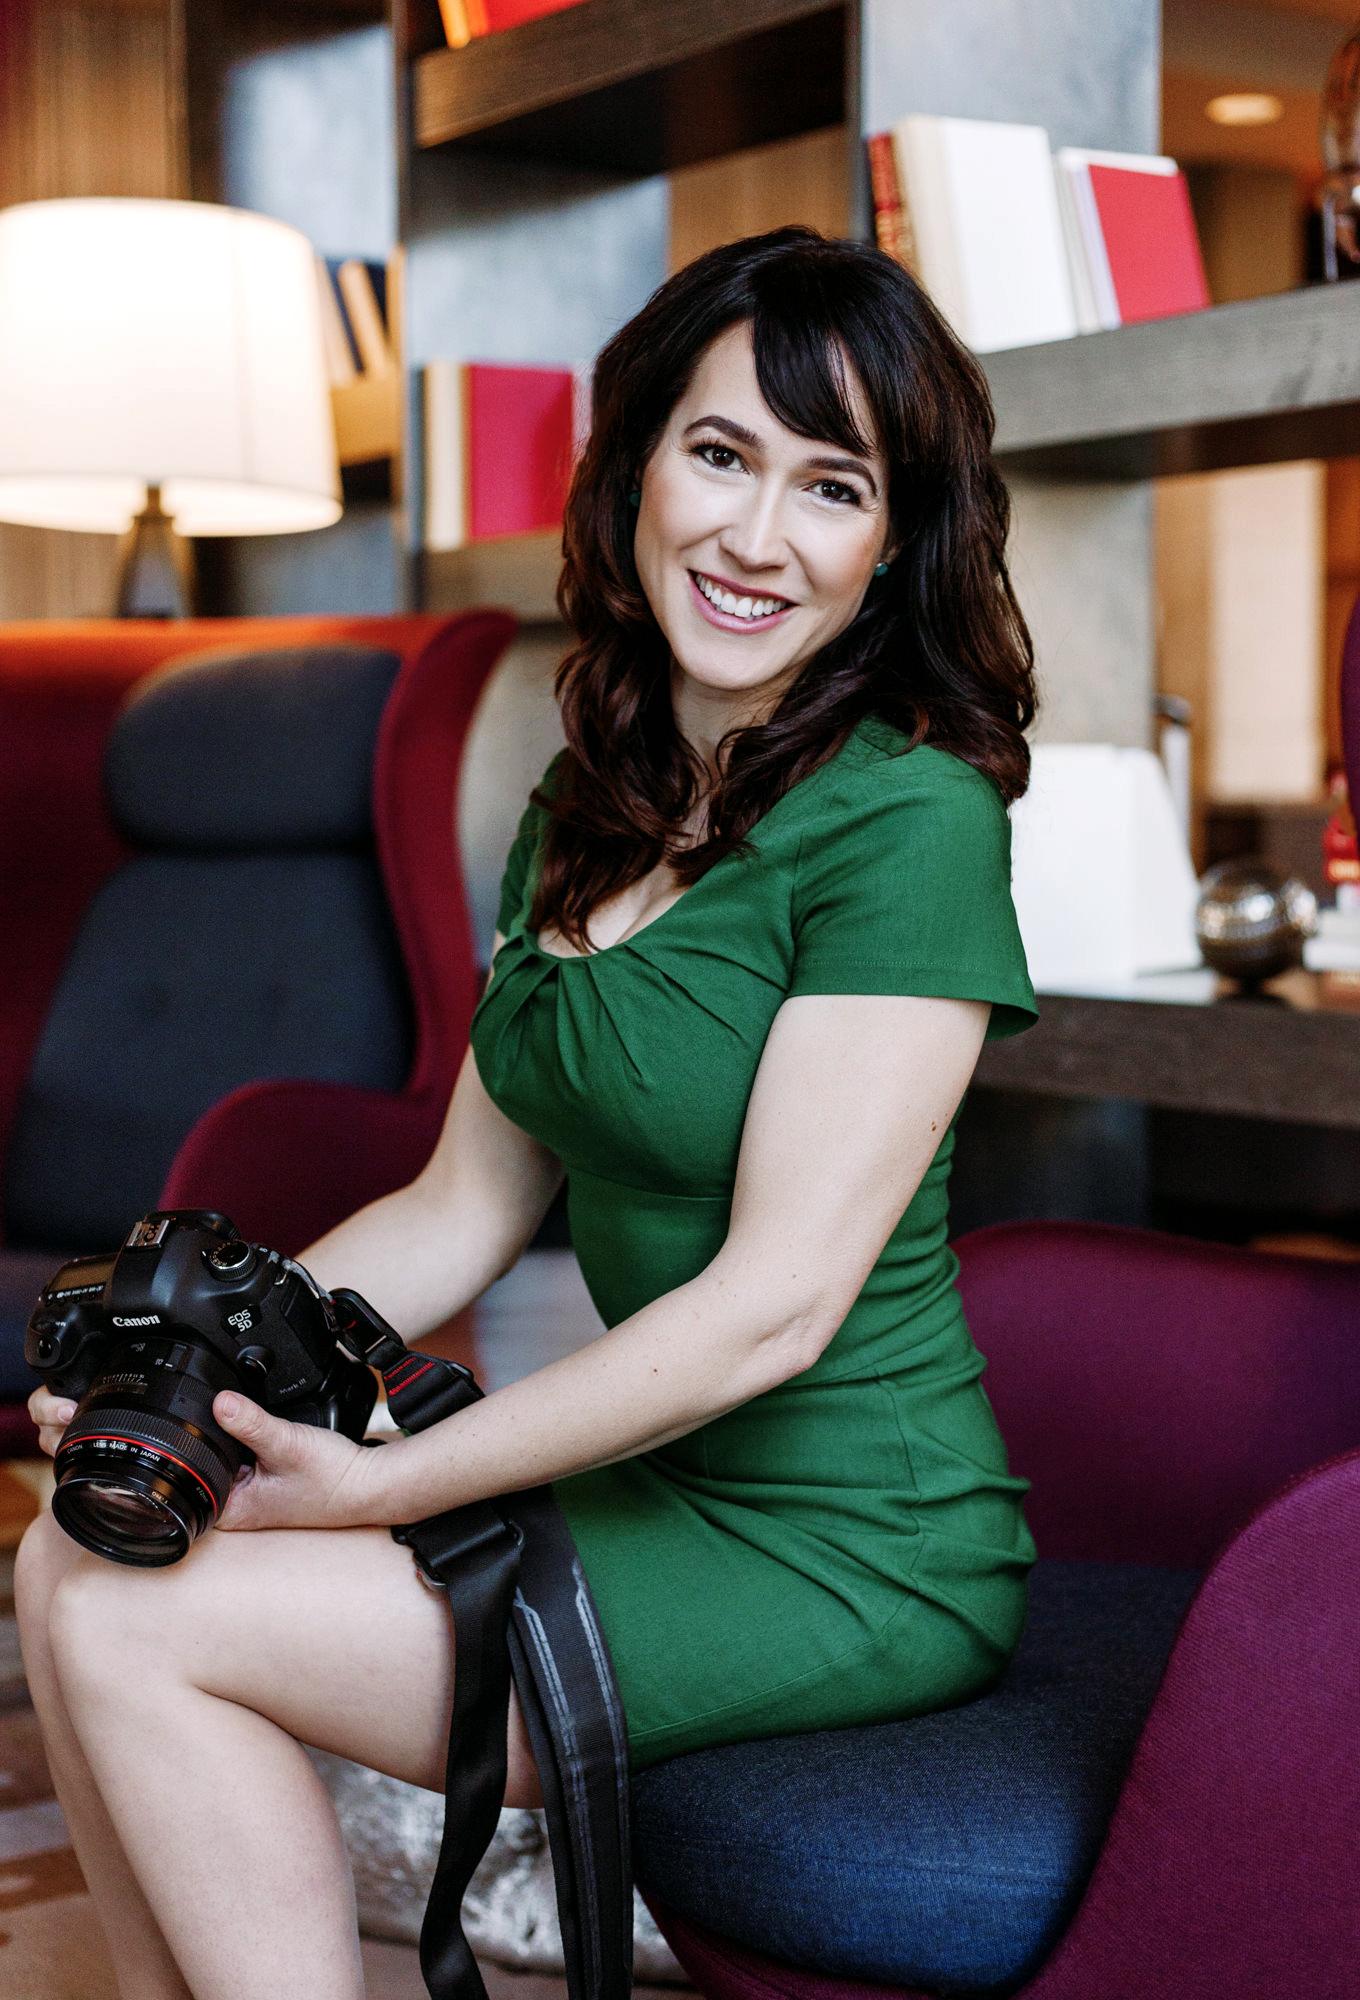 KellyBrandingPortraits-HaleyMcLainPhotography-1.JPG